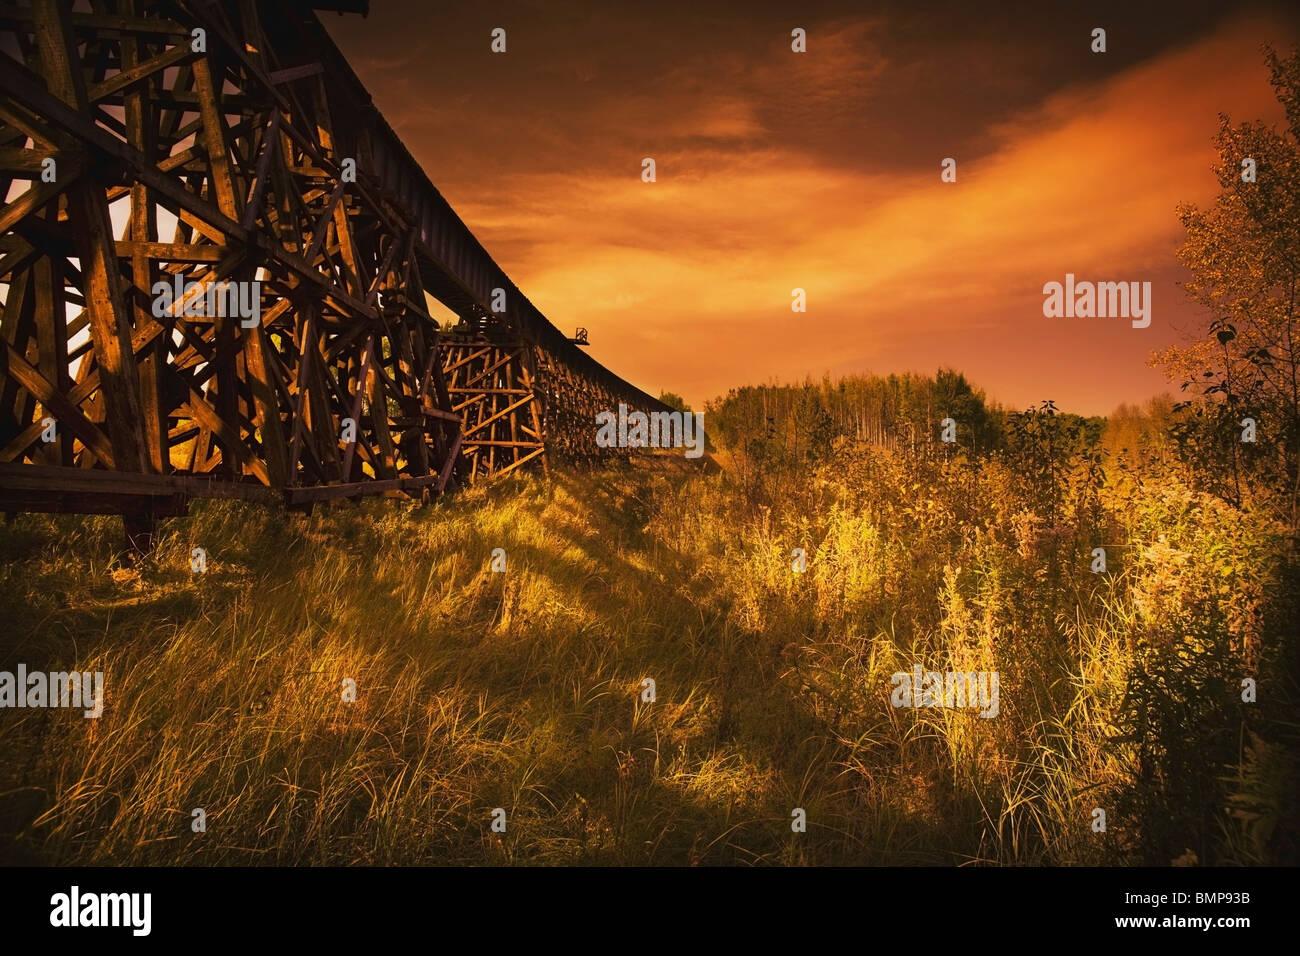 Alberta, Canada; A Train Trestle In A Sunset Stock Photo